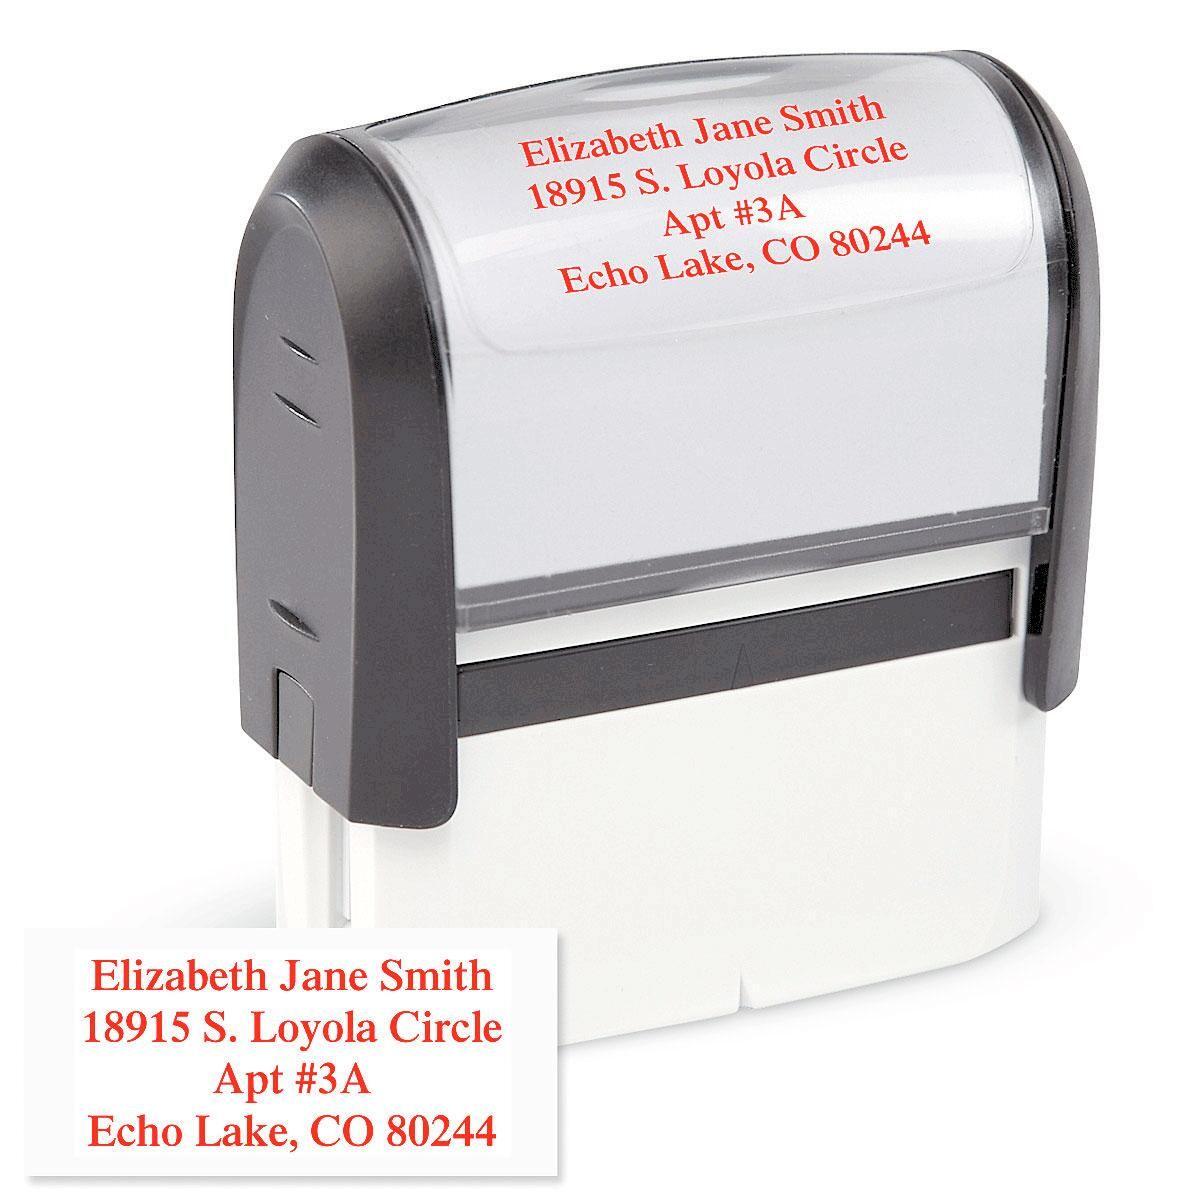 Standard Self-Inking Address Stamp - Red Ink